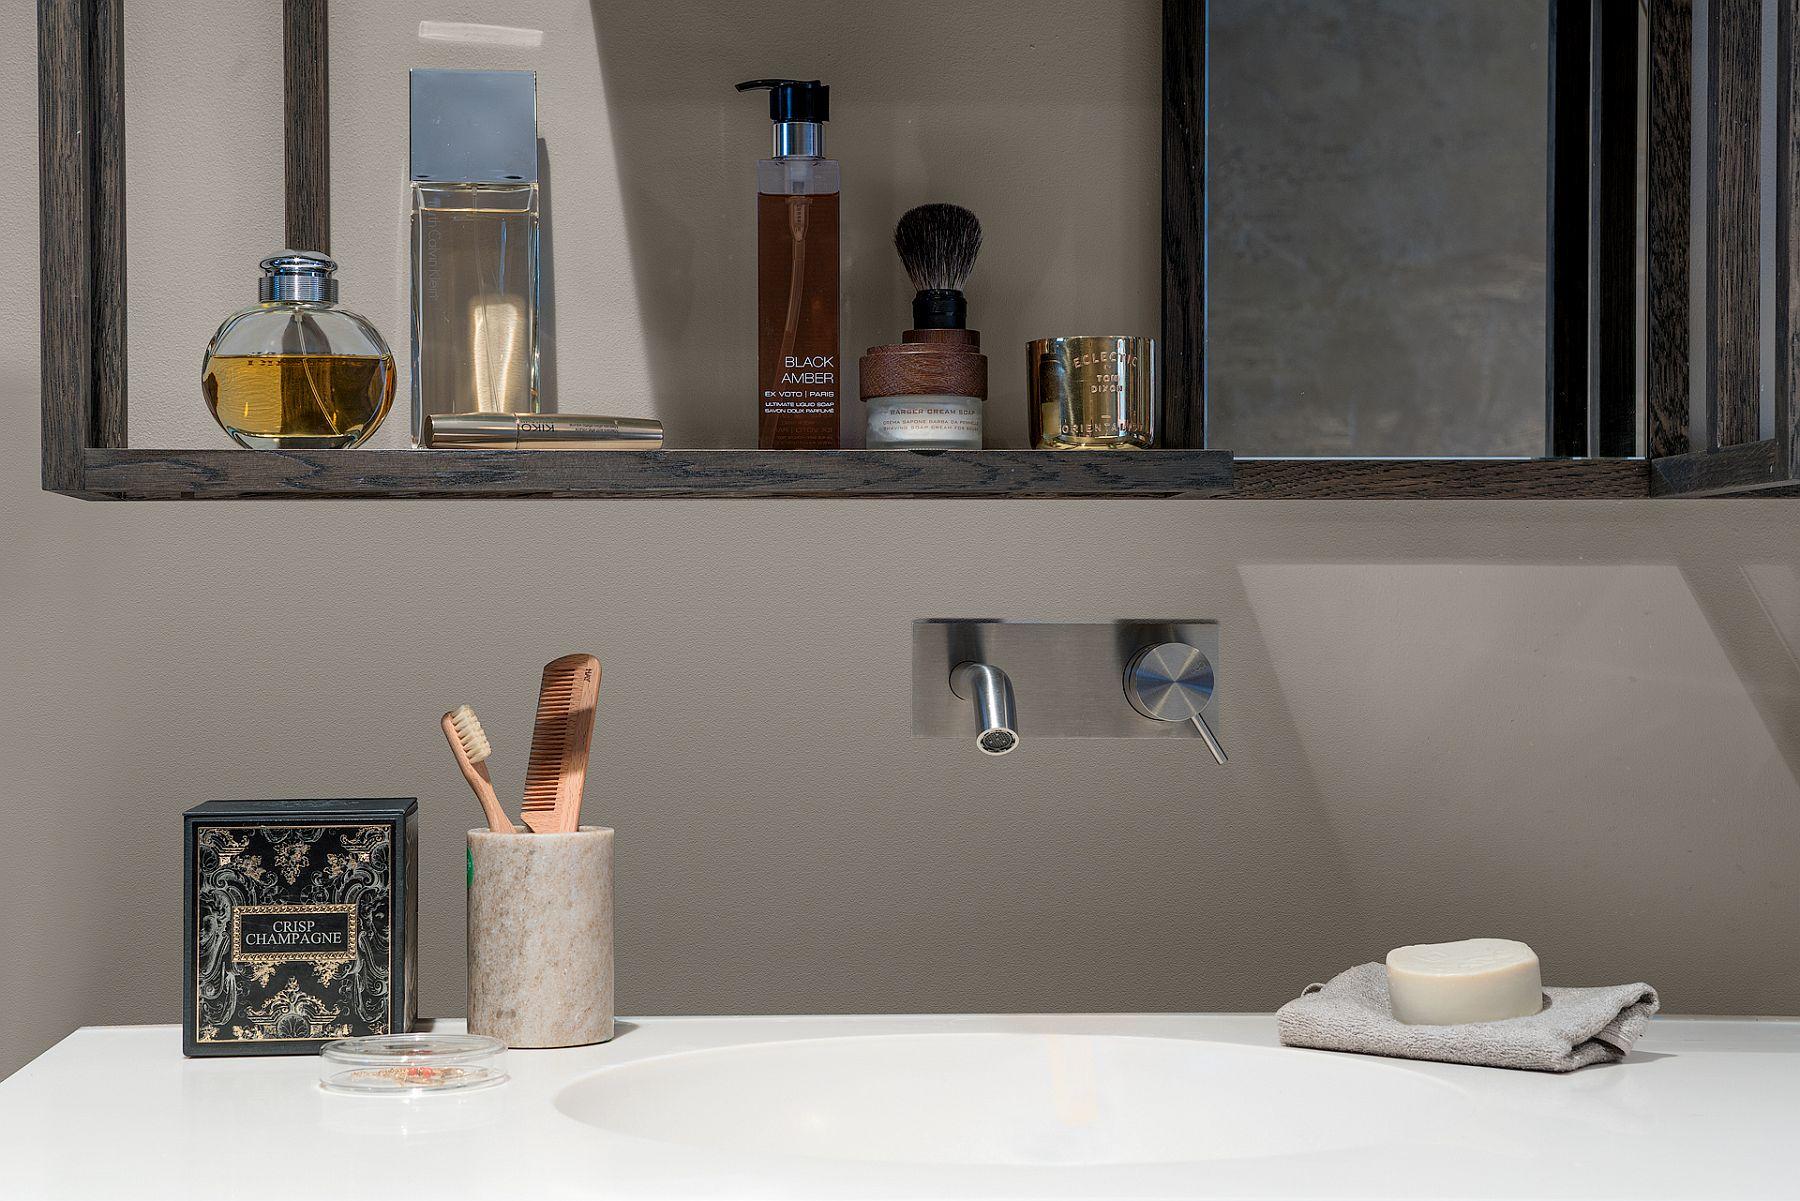 Solid wood medicine cabinet in the bathroom designed by Robert Kolenik